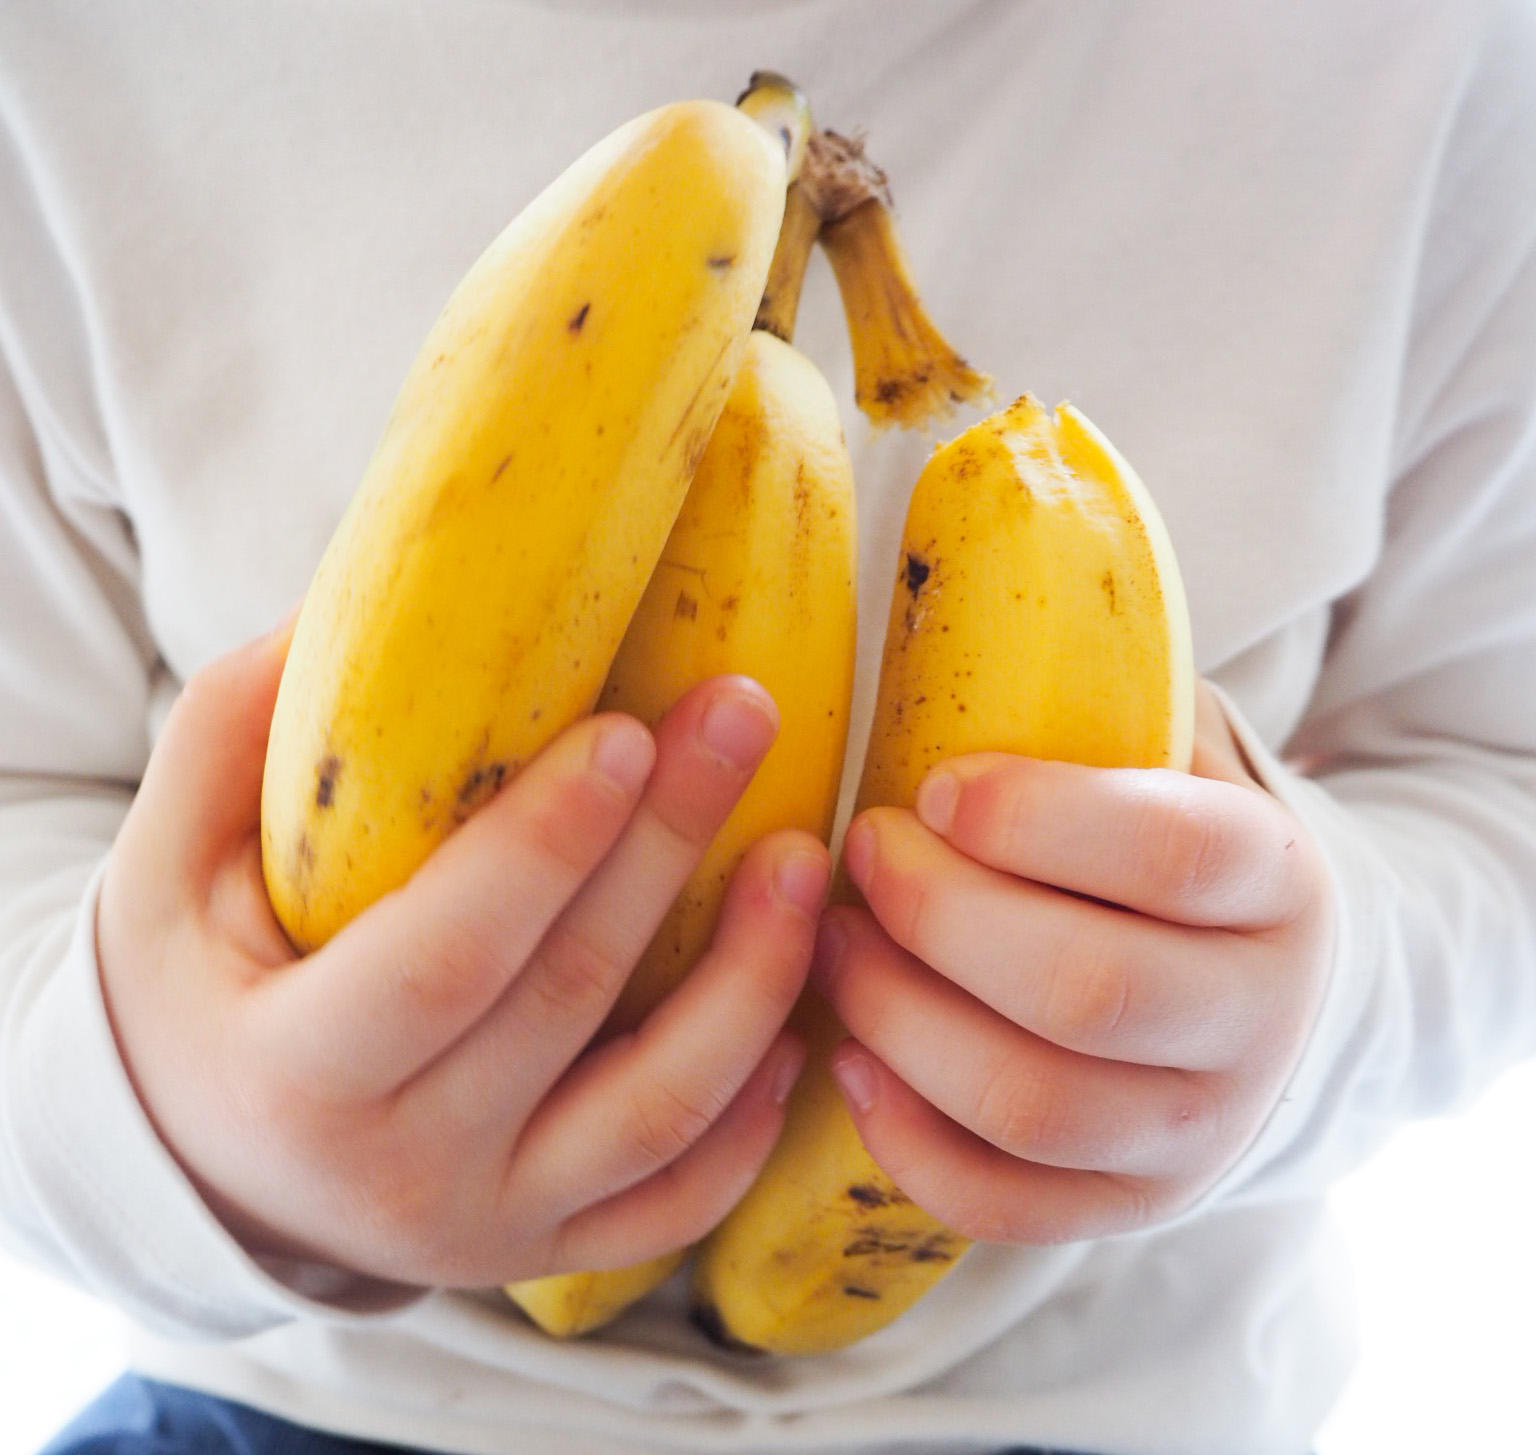 bananasjemimaholding.jpg